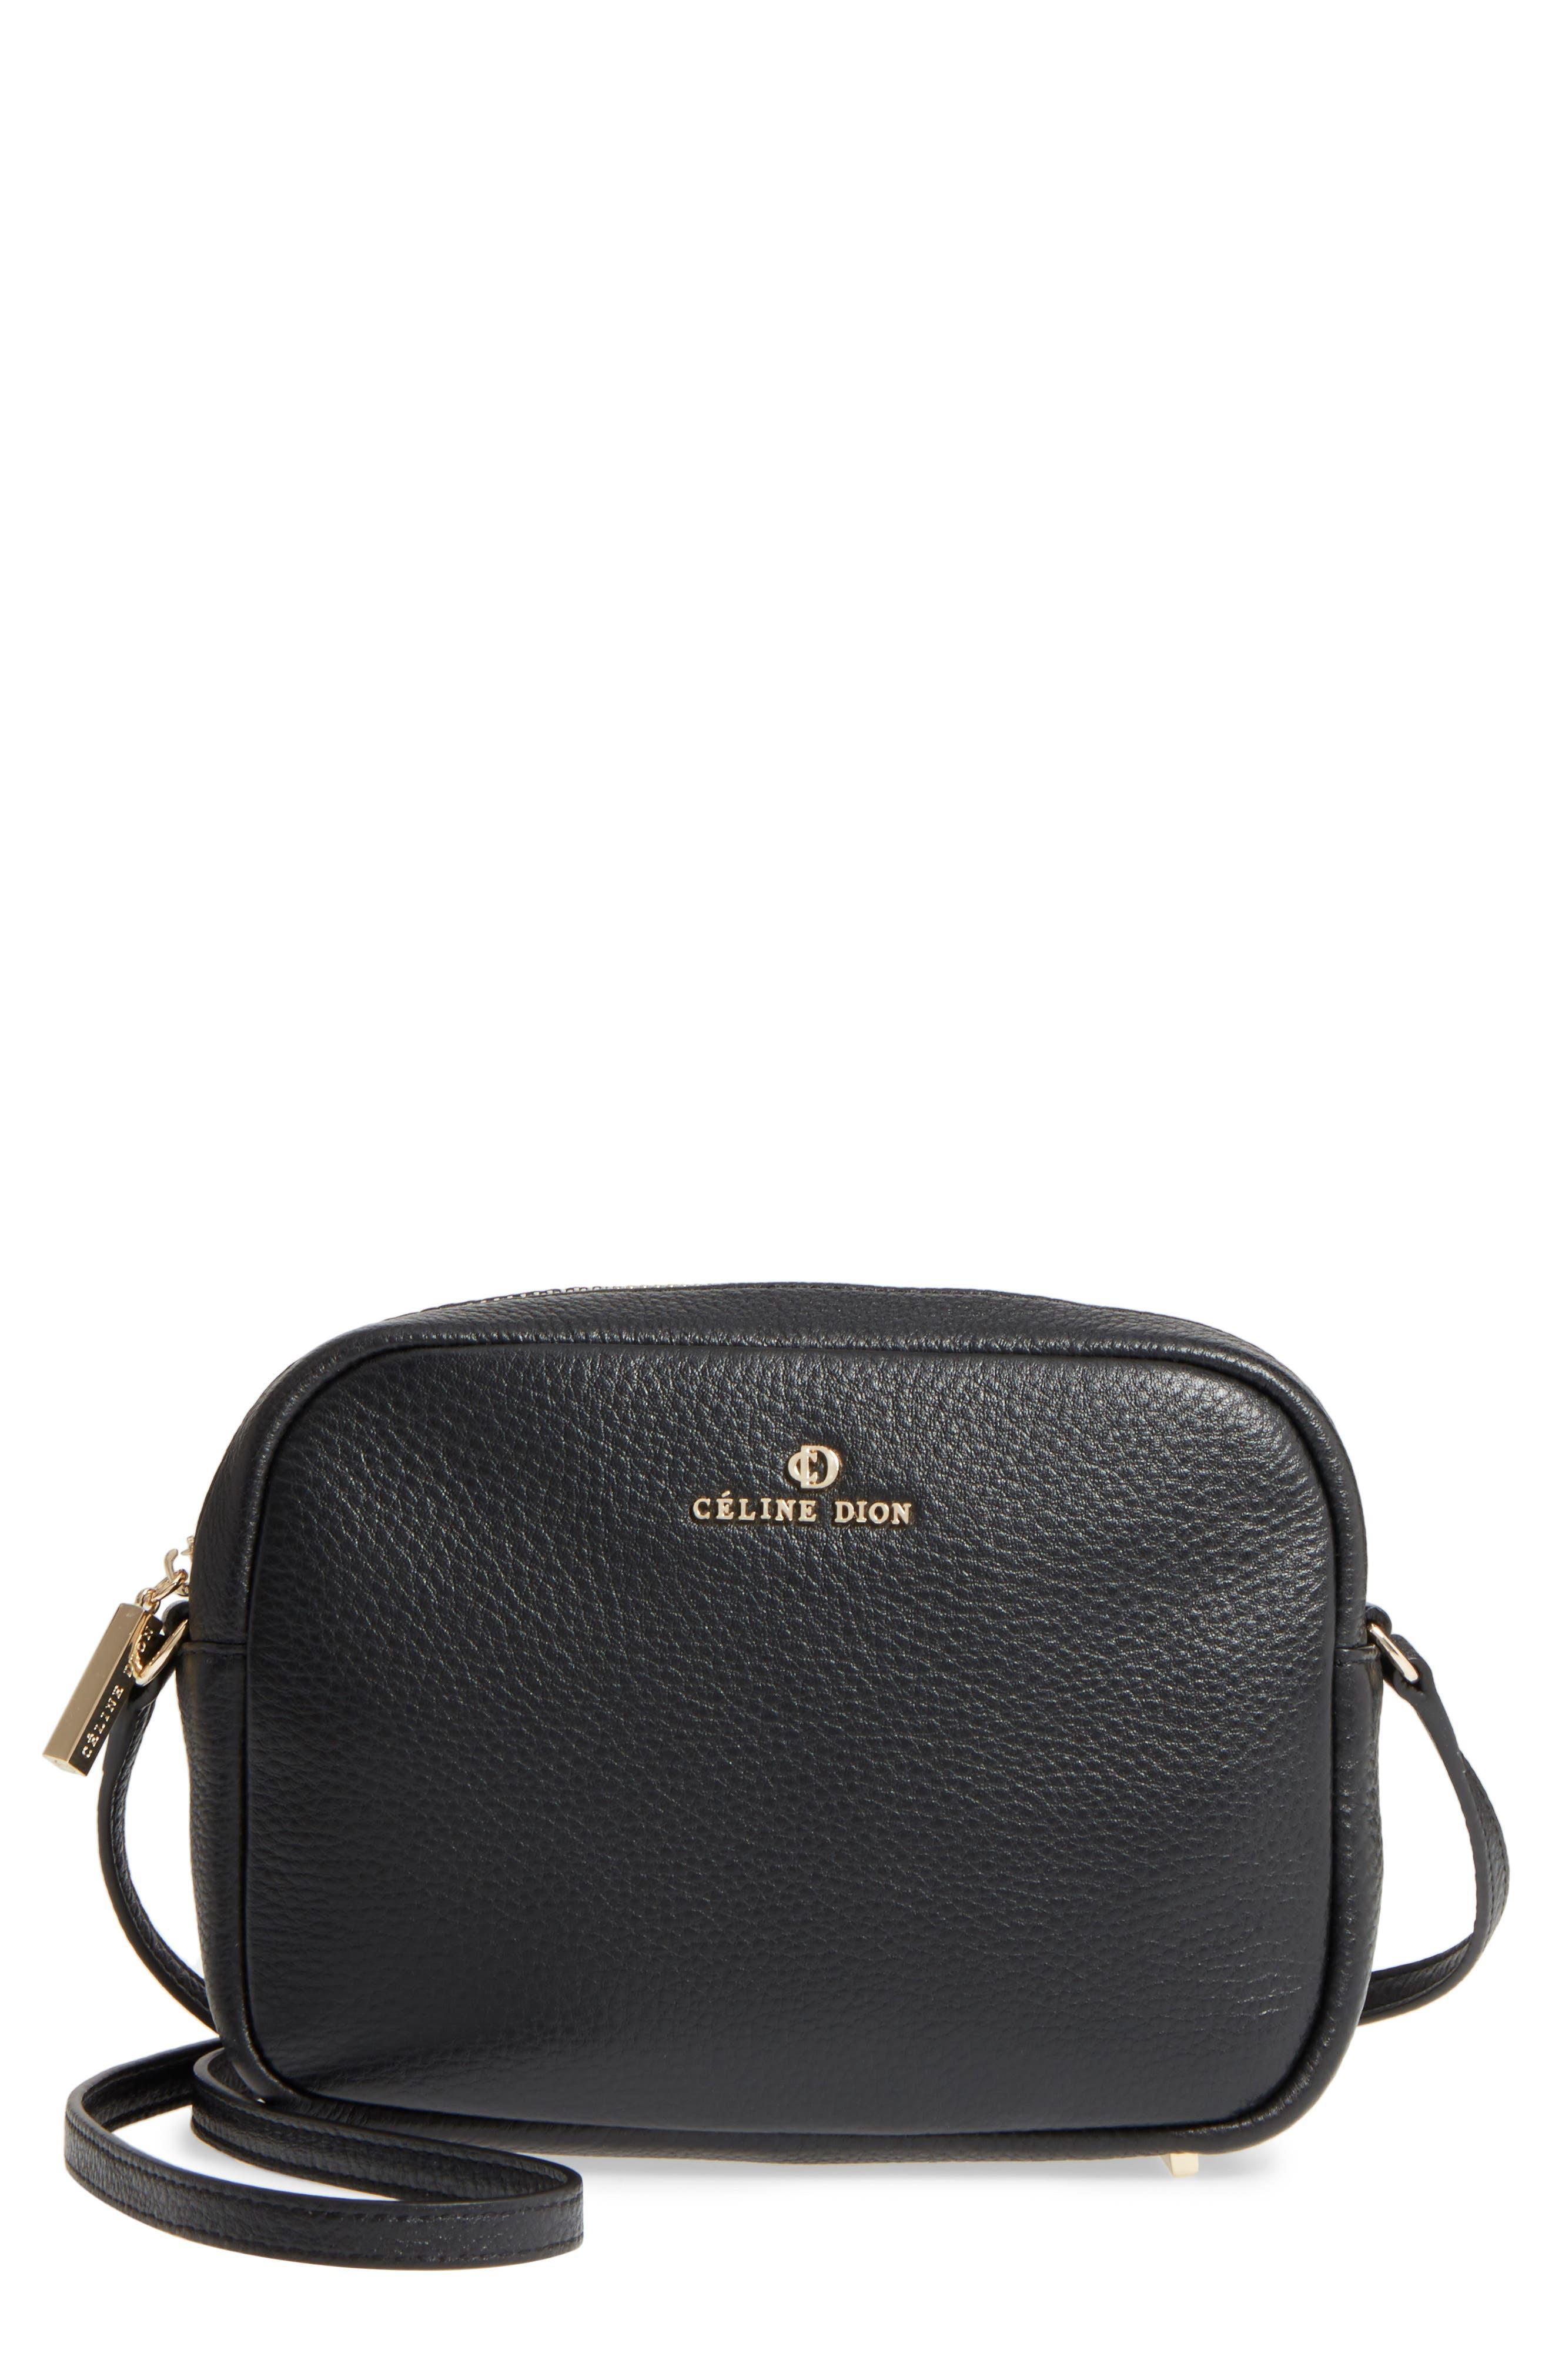 Céline Dion Adagio Leather Camera Crossbody Bag,                         Main,                         color, Black